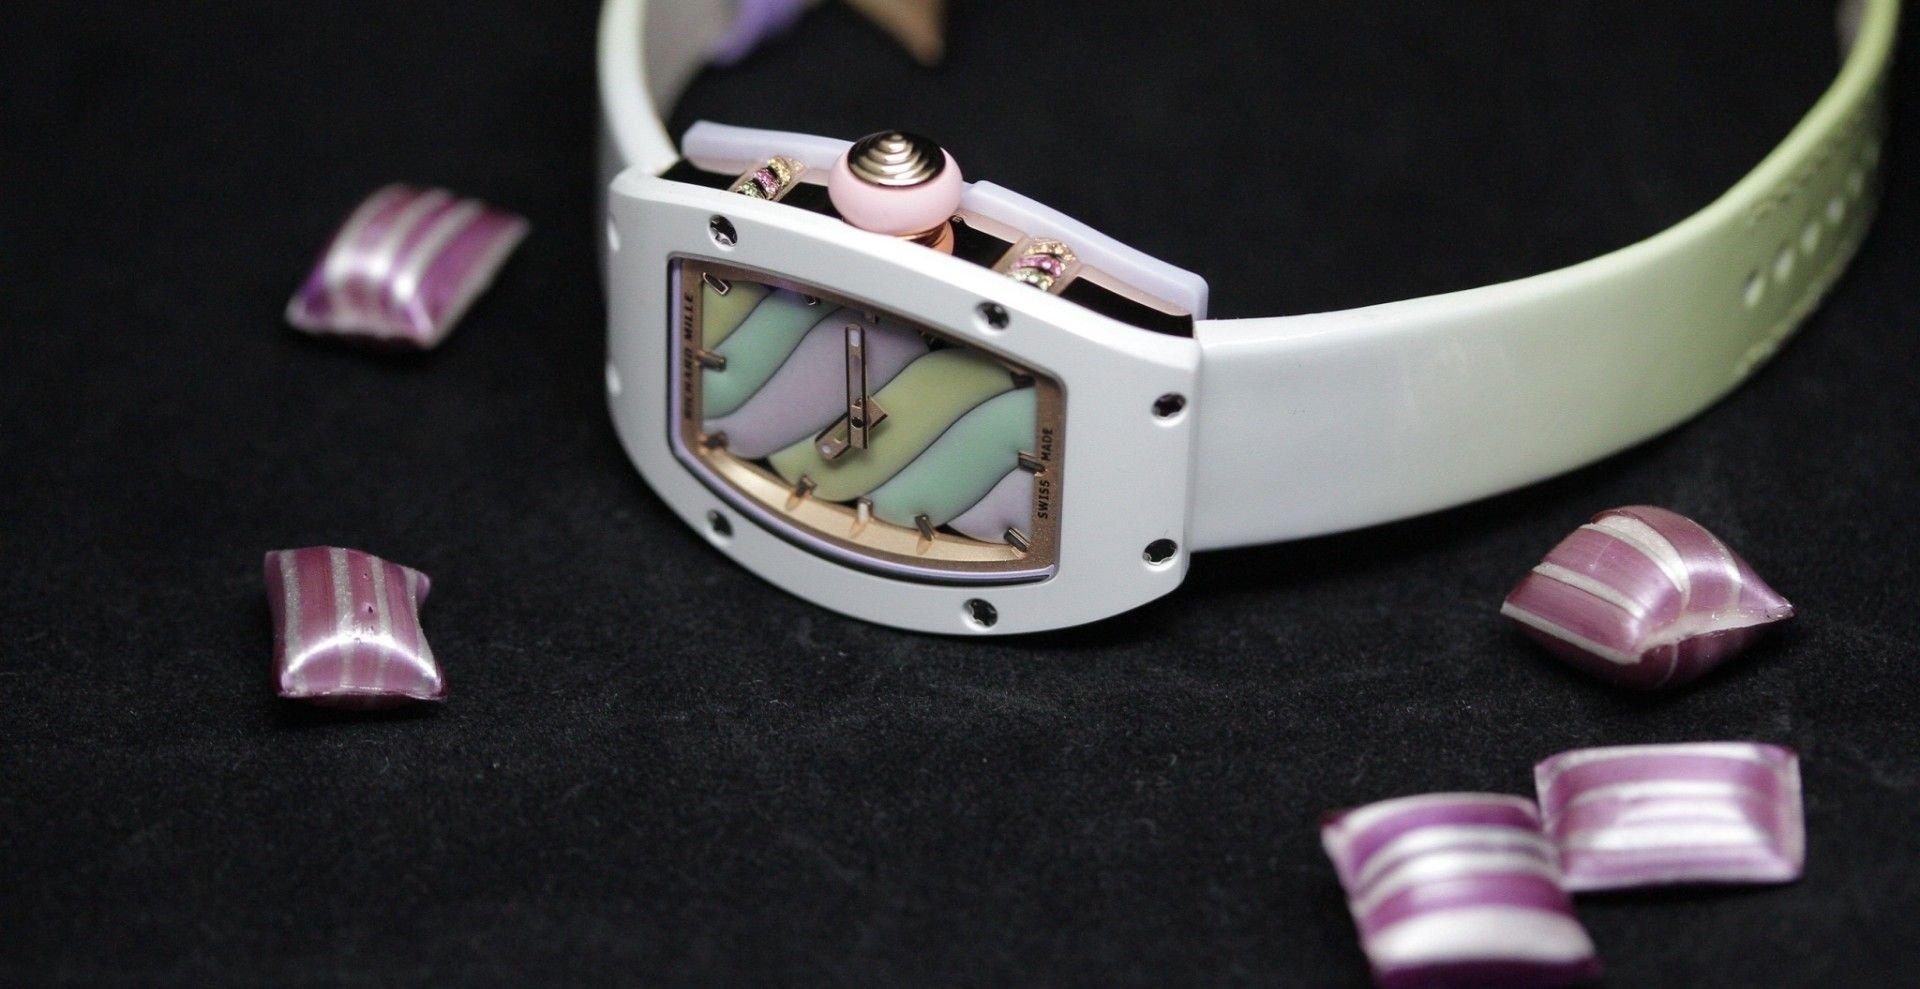 【SIHH 2019錶展報導】眼睛的美味甜點:RICHARD MILLE BONBON 糖果系列腕錶